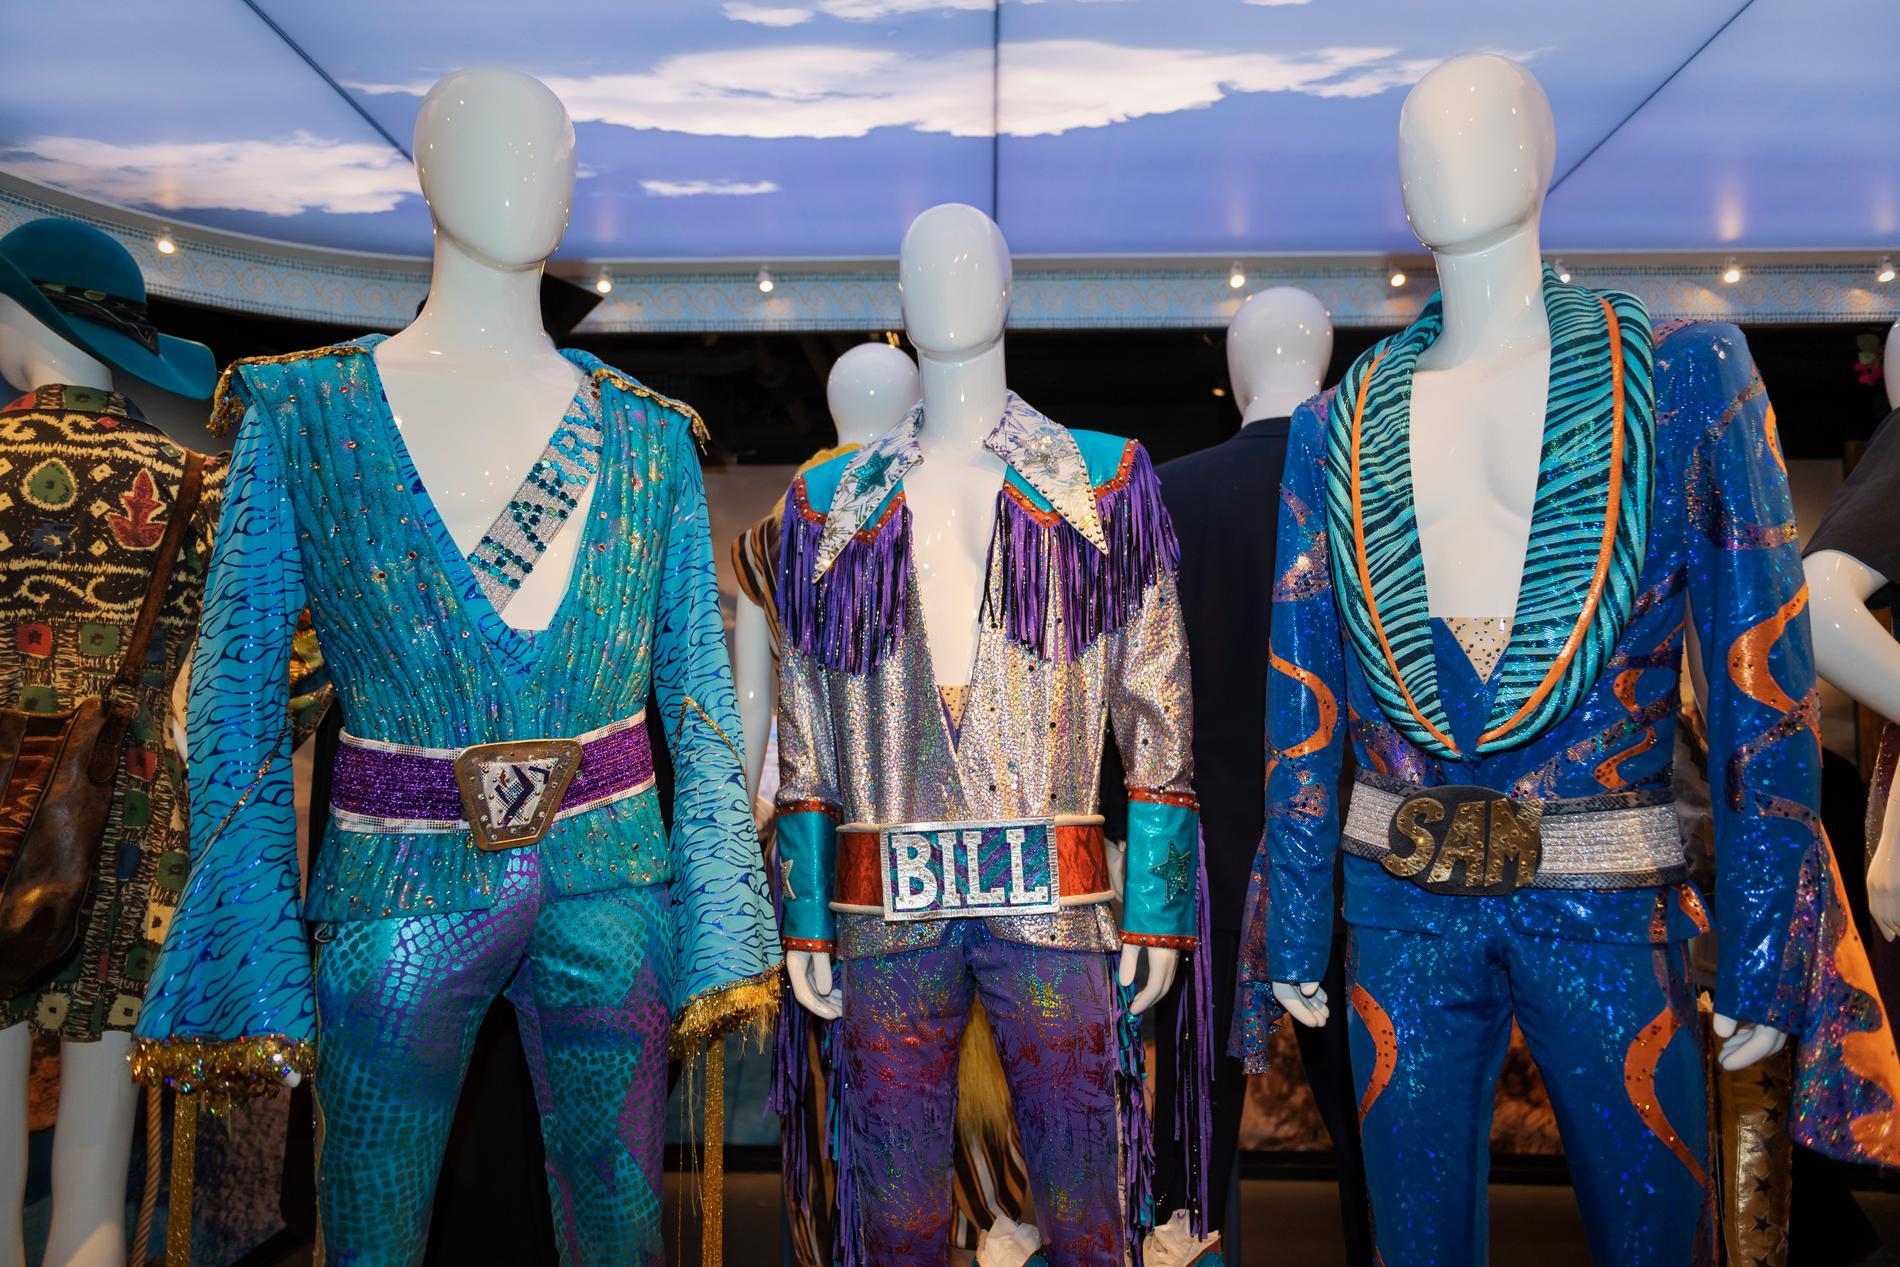 "Kostymer från Mamma Mia filmen i utställningen ""Mamma mia! Behind the movie magic""."